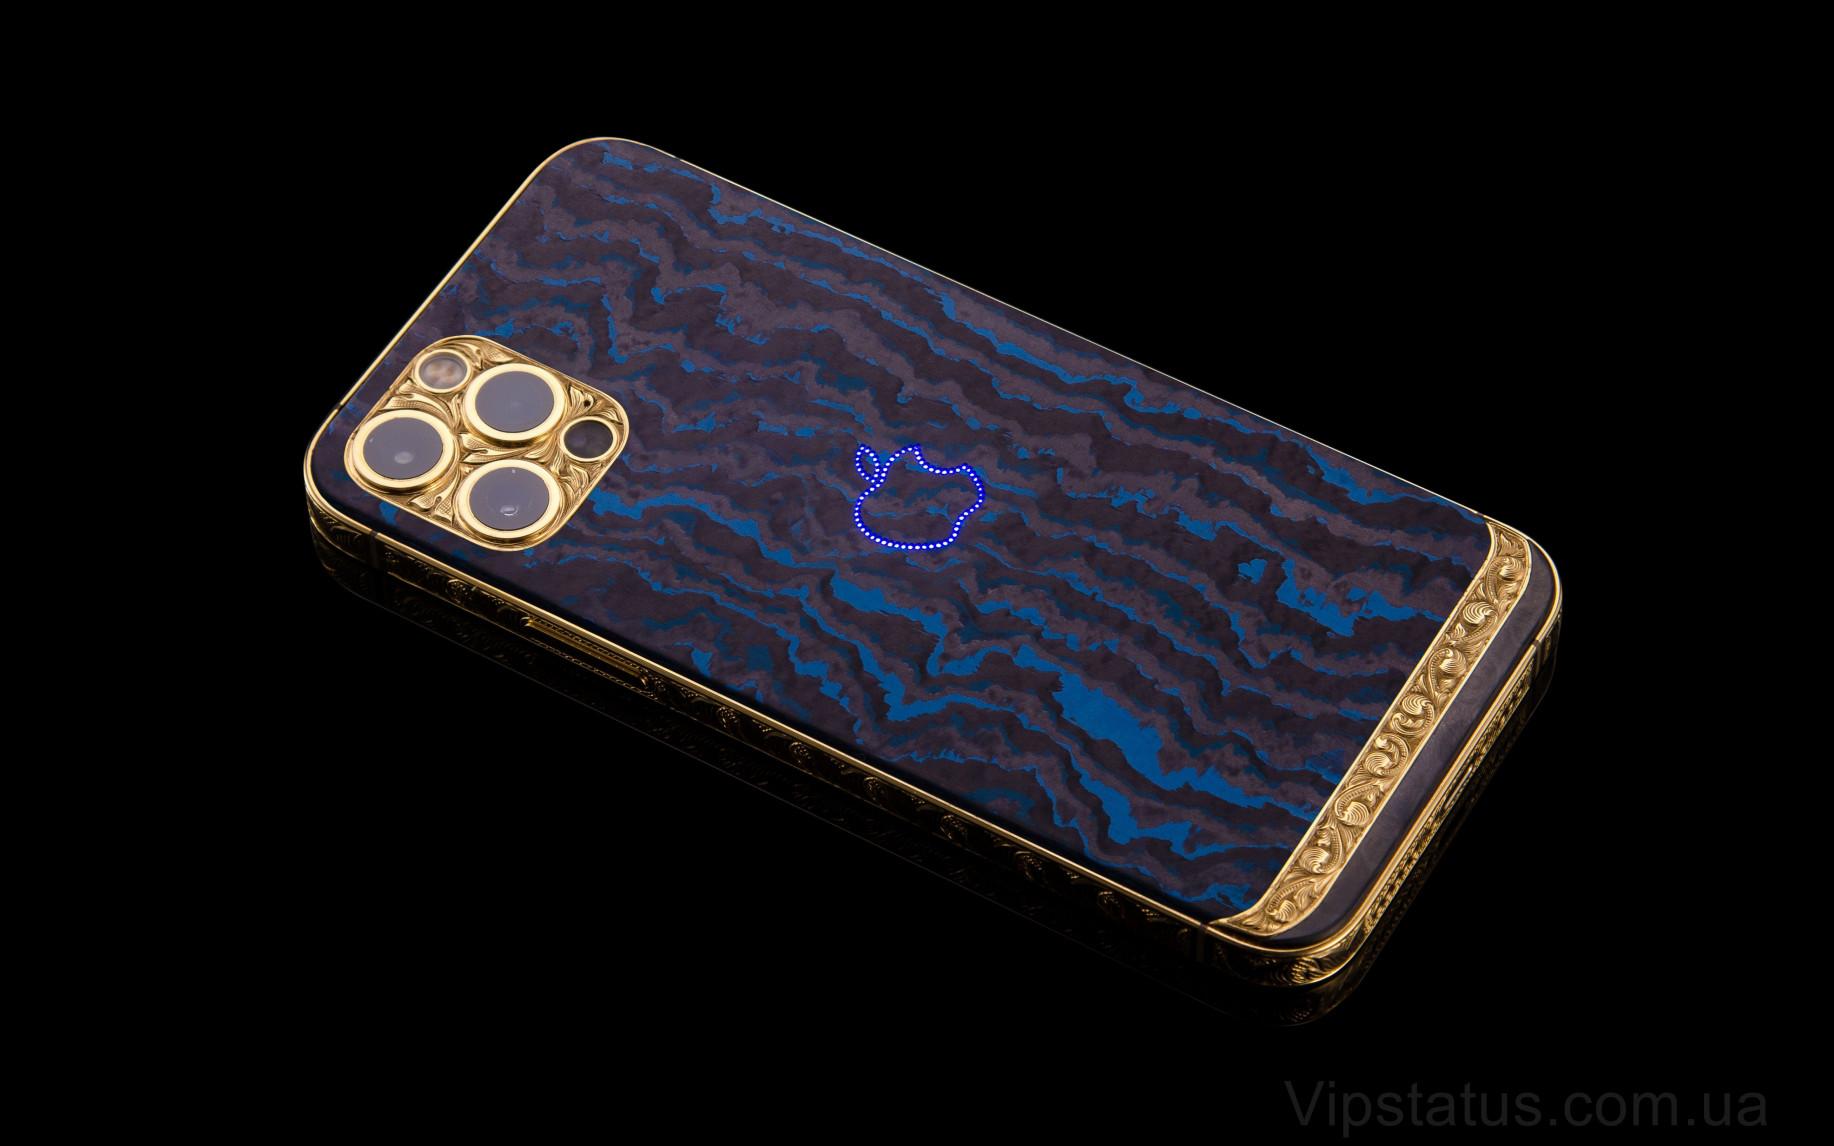 Elite Blue Dream Gold IPHONE 12 PRO MAX 512 GB Blue Dream Gold IPHONE 12 PRO MAX 512 GB image 2